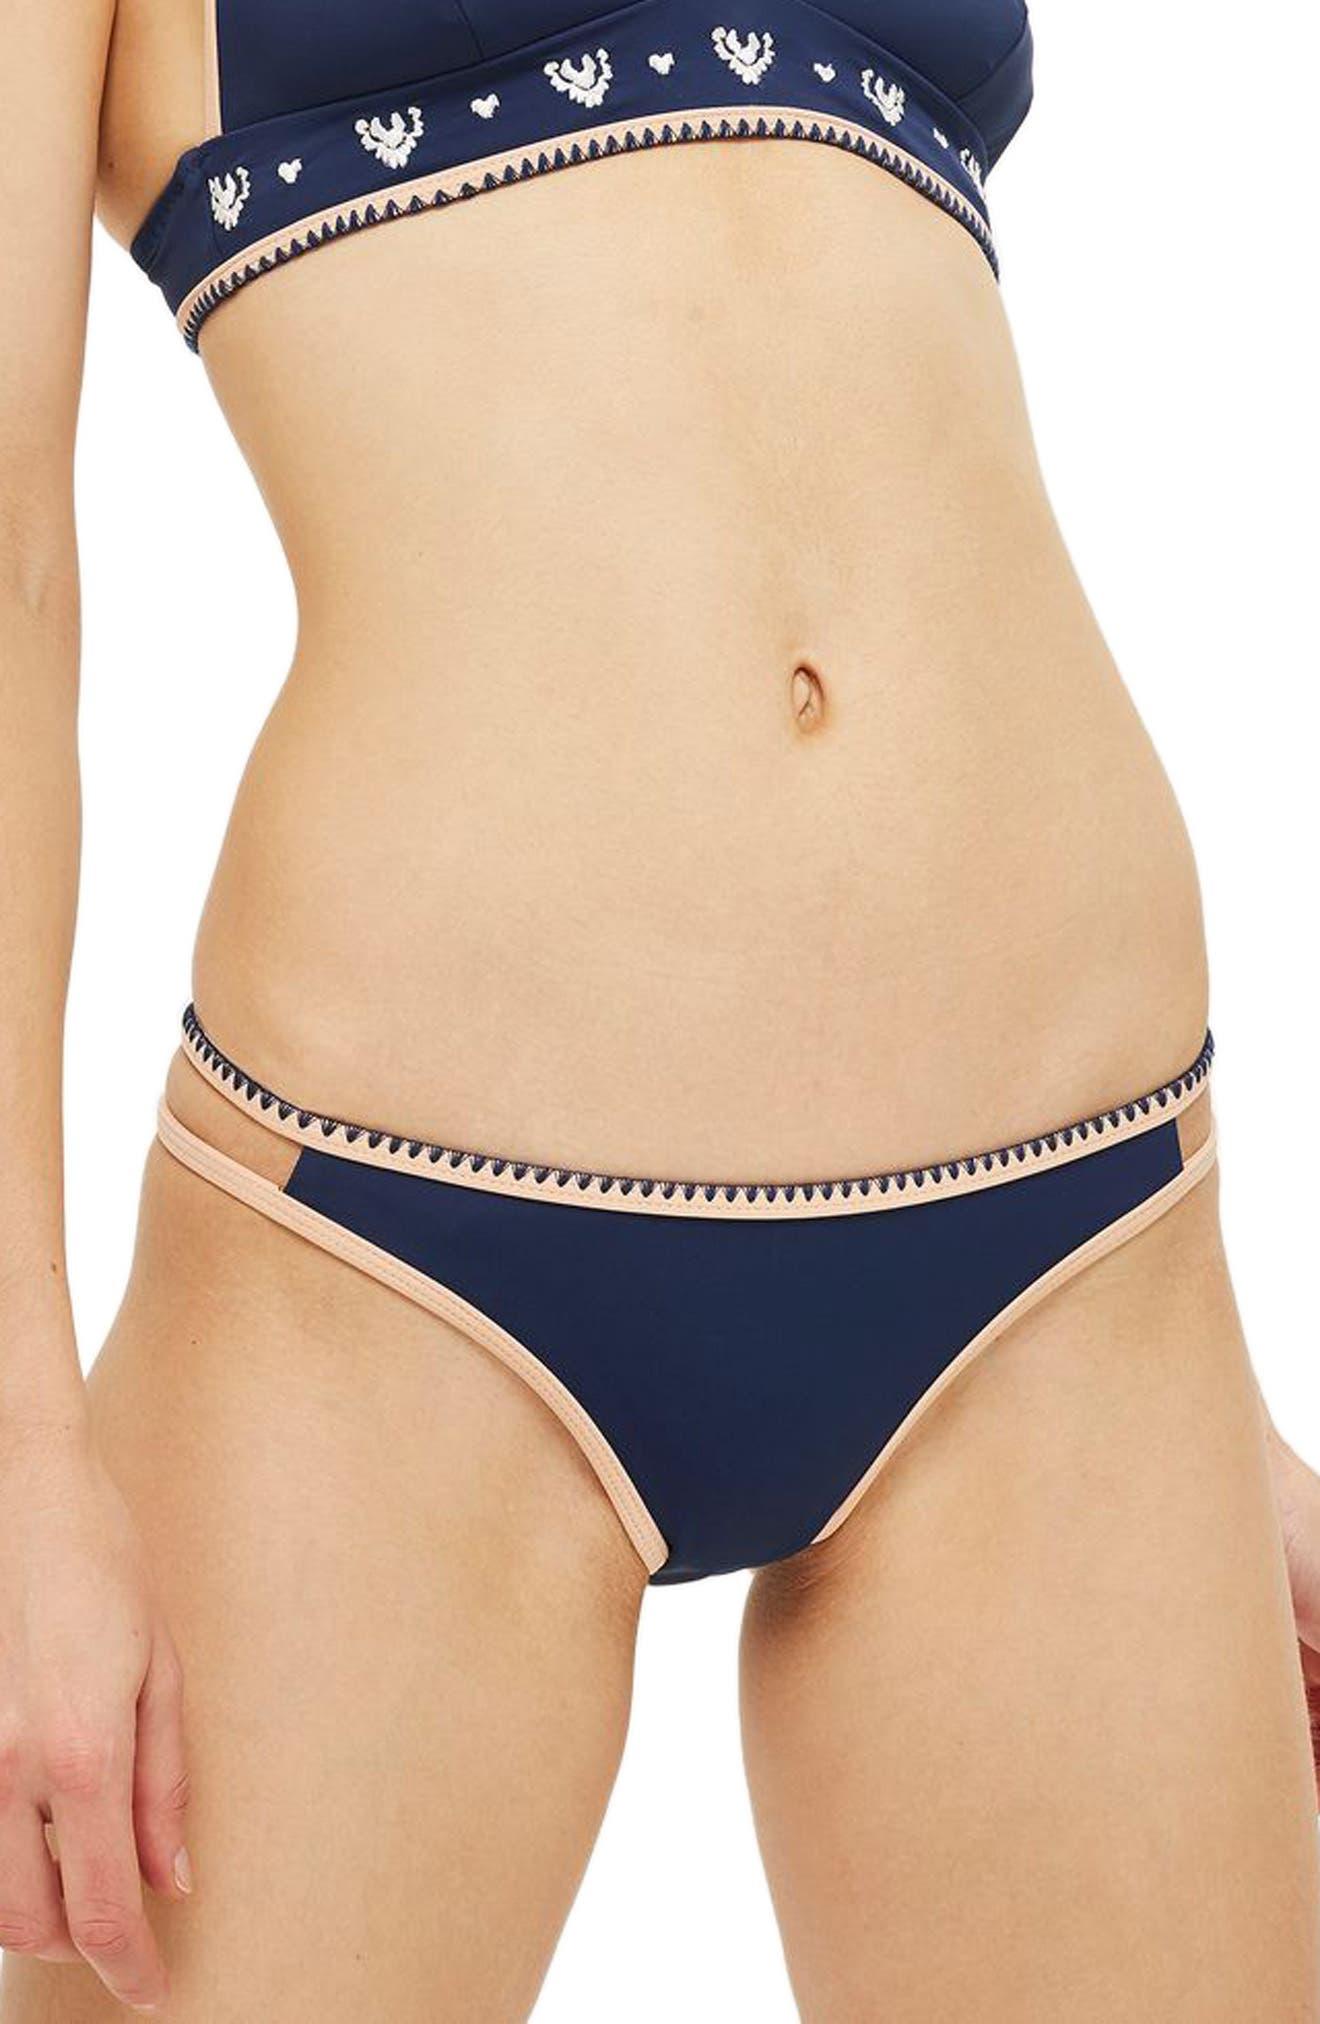 Stitched Edge Bikini Bottoms,                         Main,                         color, 410